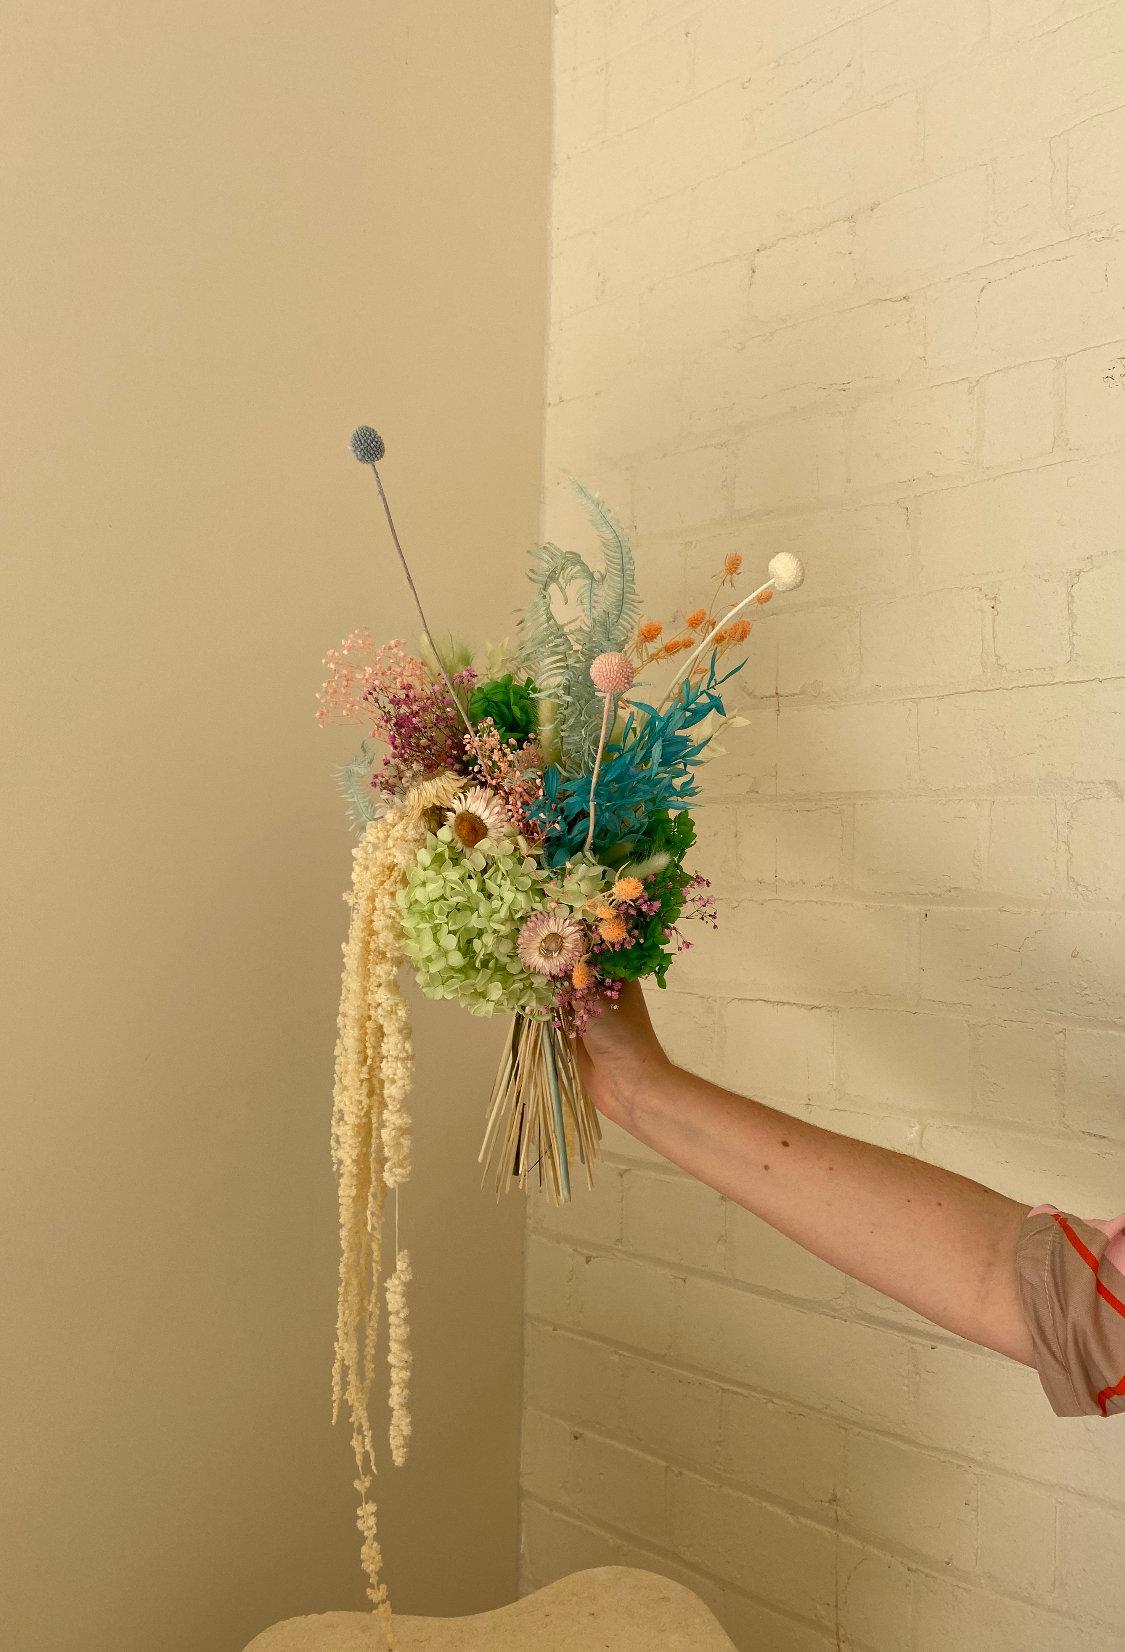 Pisces inspired everlasting floral arrangement handmade by Melbourne Floral Artist xxflos